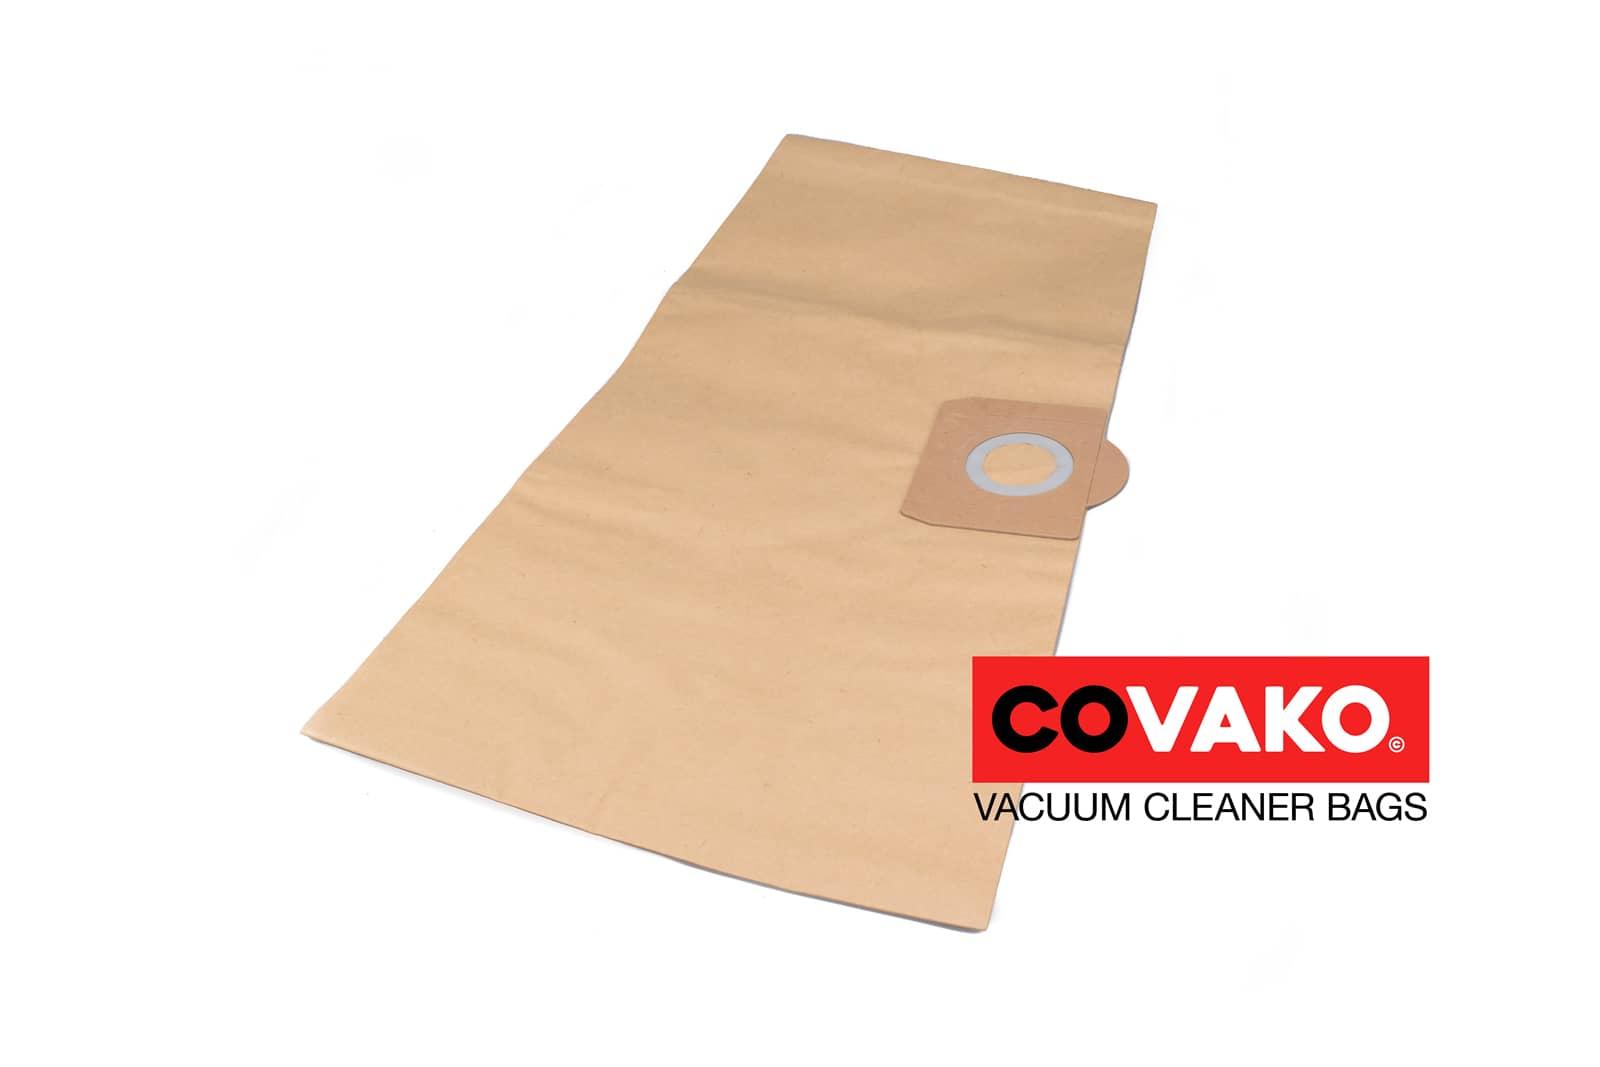 ewt Boxter 30 S / Paper - ewt vacuum cleaner bags